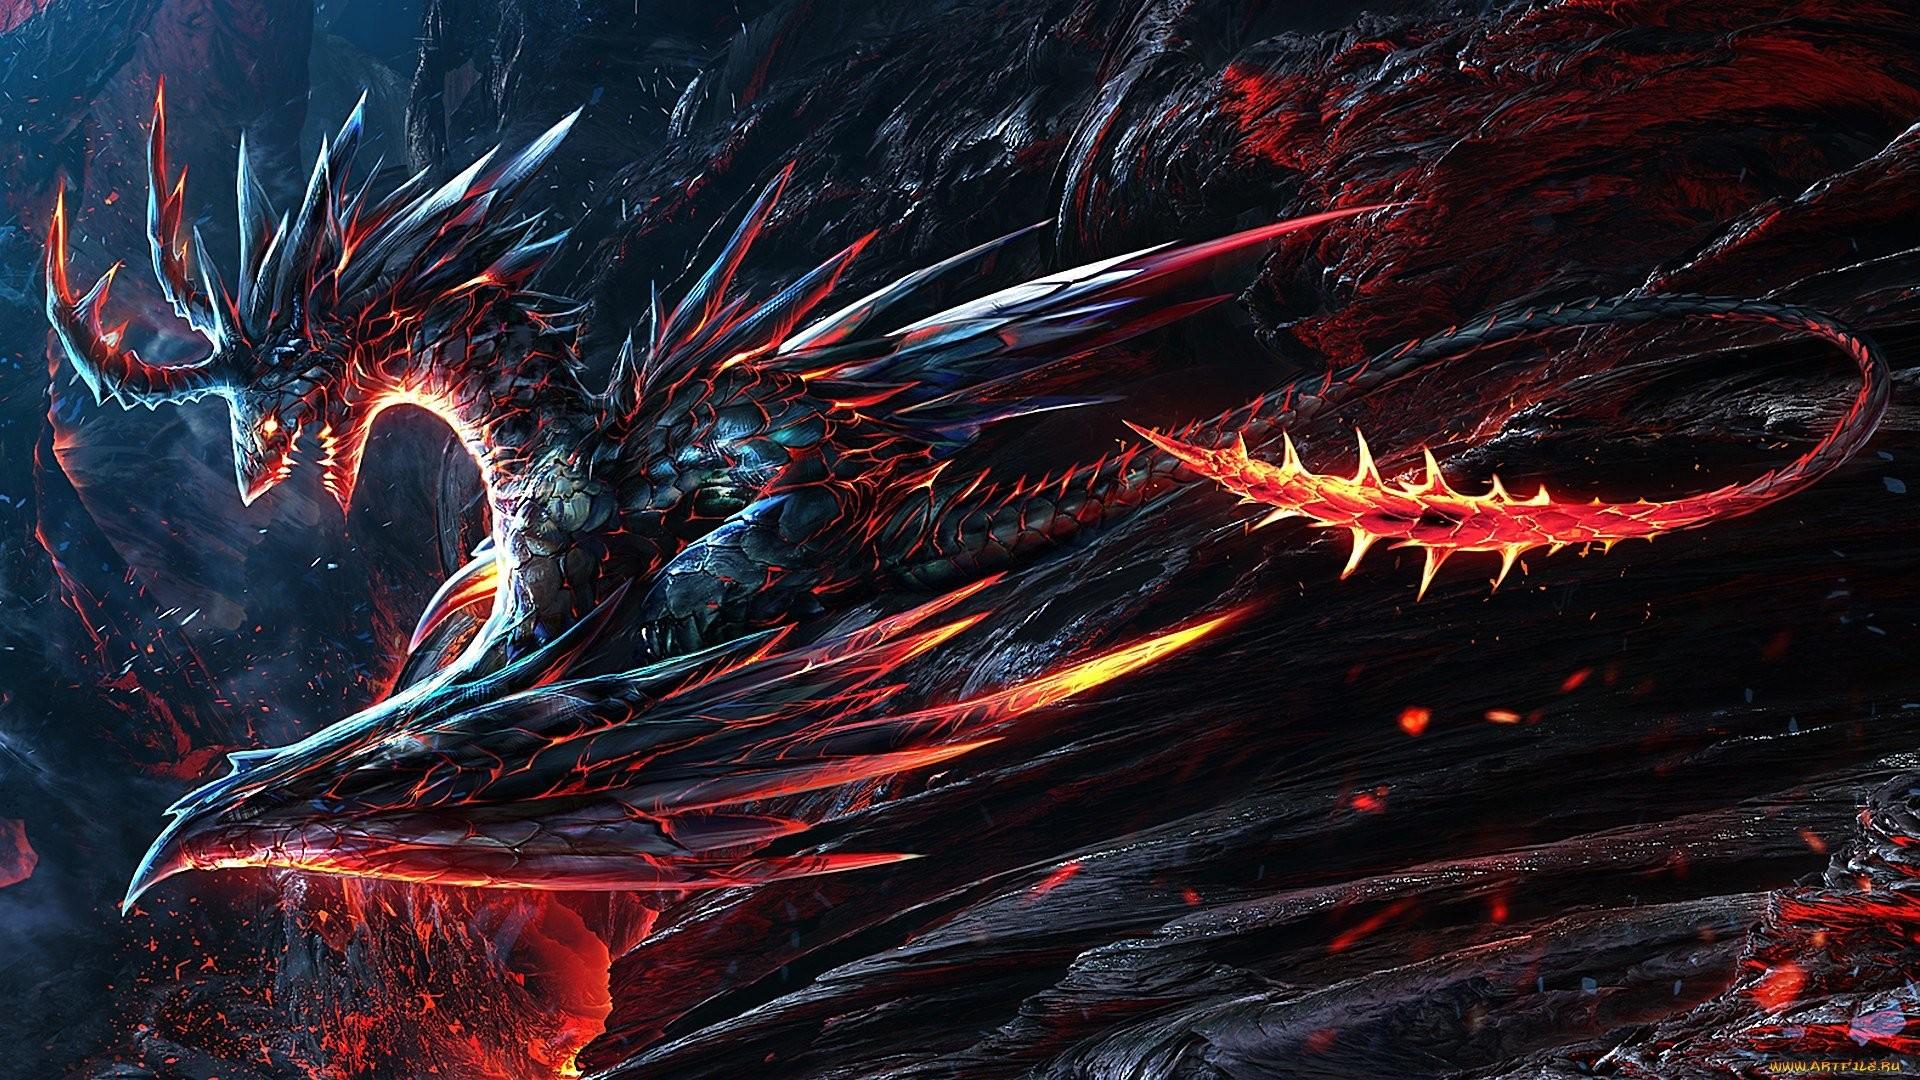 Res: 1920x1080, Wallpaper volcano lava dragon